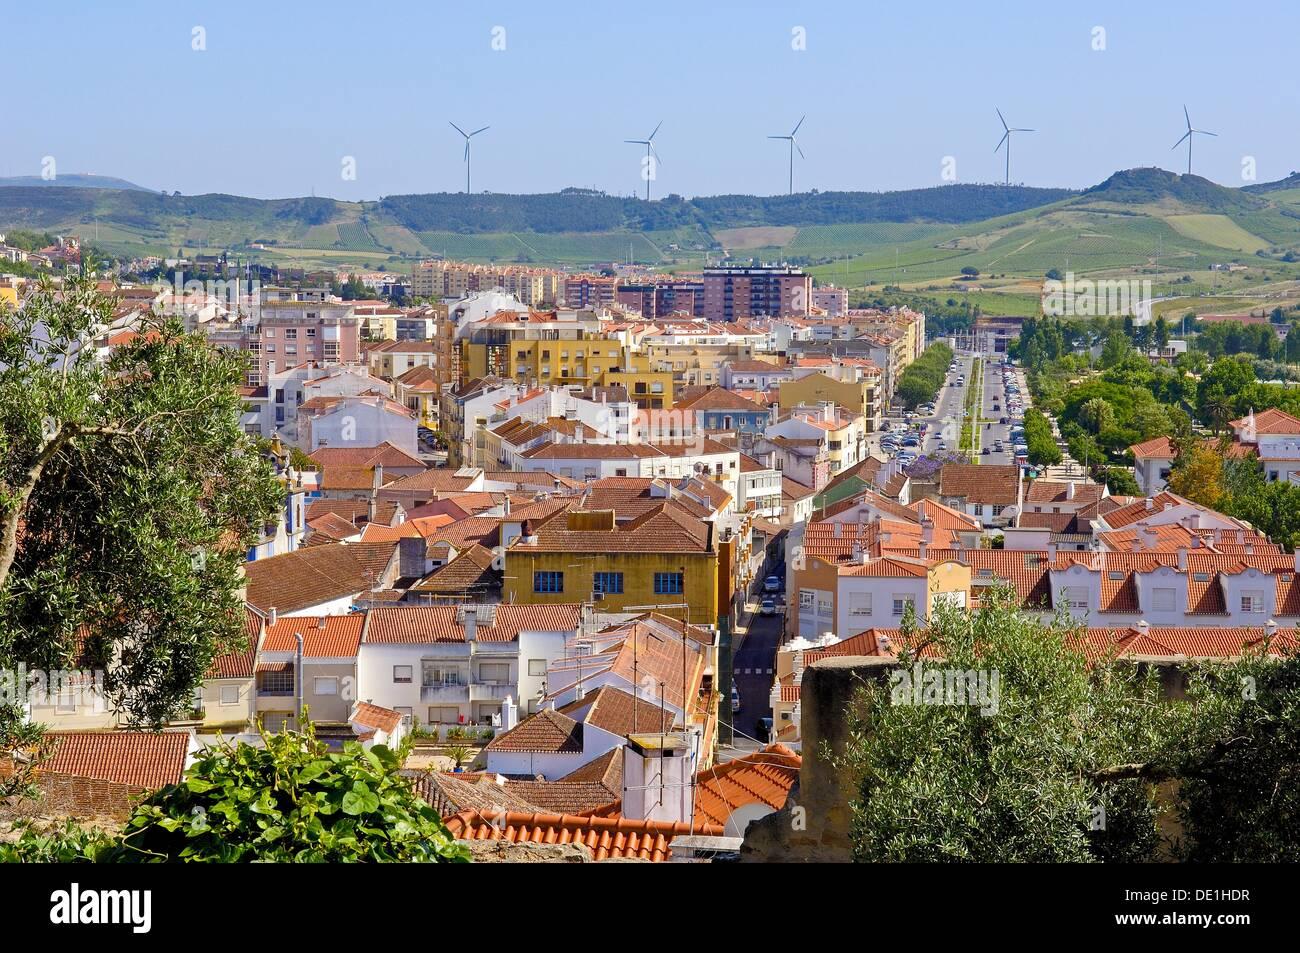 Torres Vedras, Lisbon distric, Estremadura, Portugal. - Stock Image